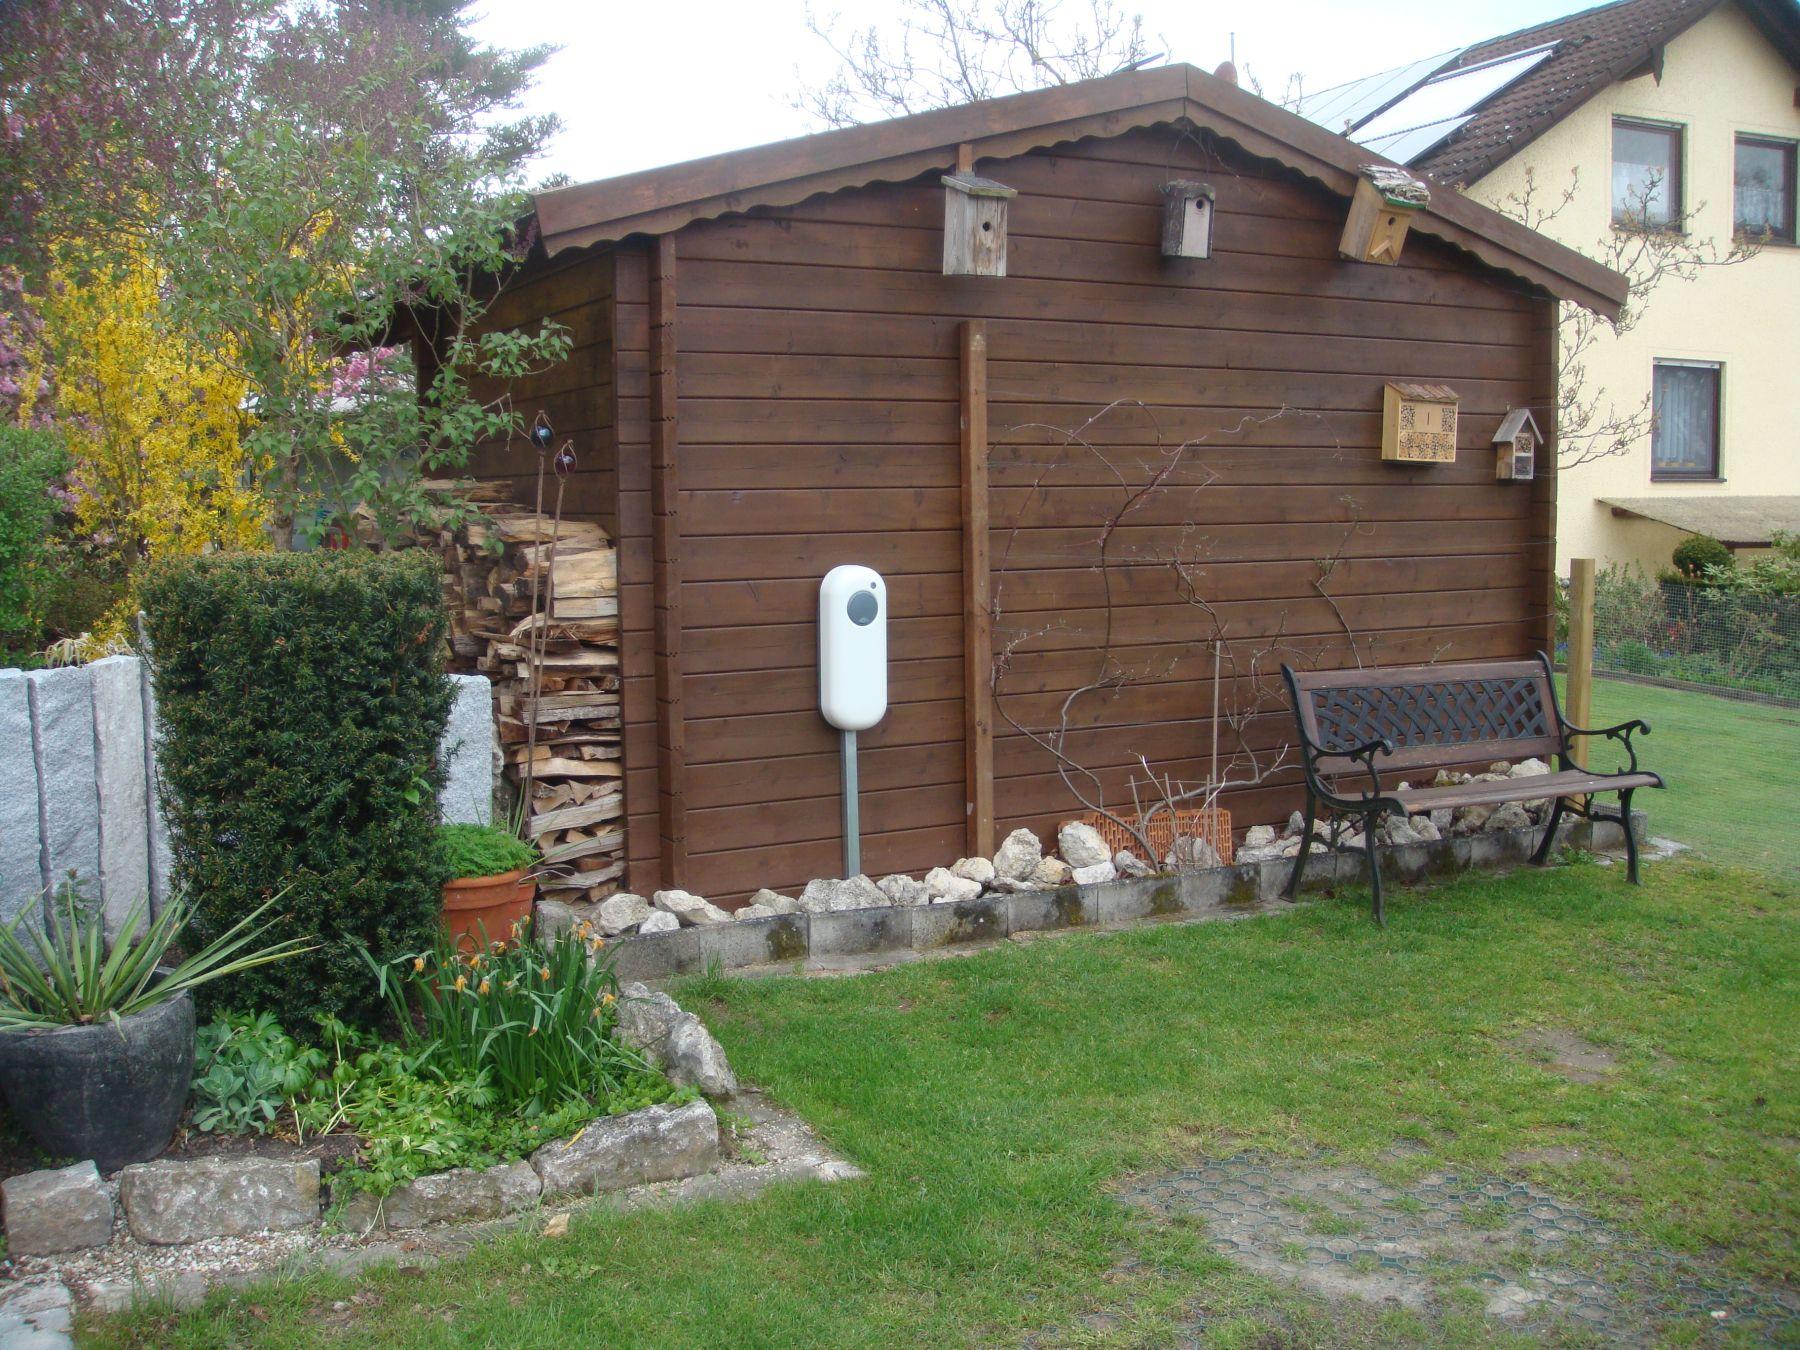 elektroauto ladestation in burgebrach k ttnitzstra e 18. Black Bedroom Furniture Sets. Home Design Ideas